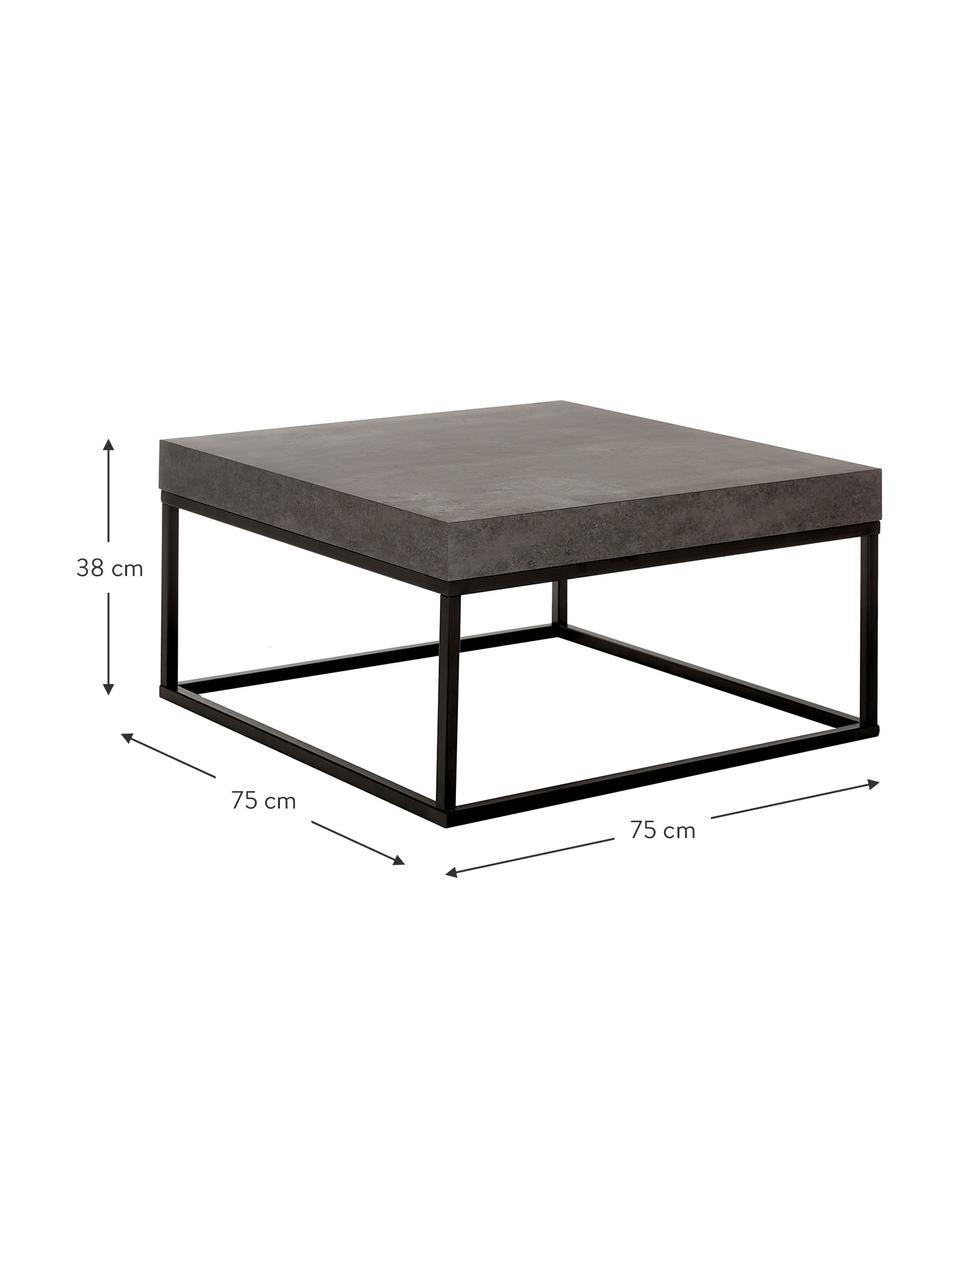 Couchtisch Ellis in Betonoptik, Tischplatte: Leichtbau-Wabenstruktur, , Gestell: Metall, lackiert, Betonoptik, 75 x 38 cm